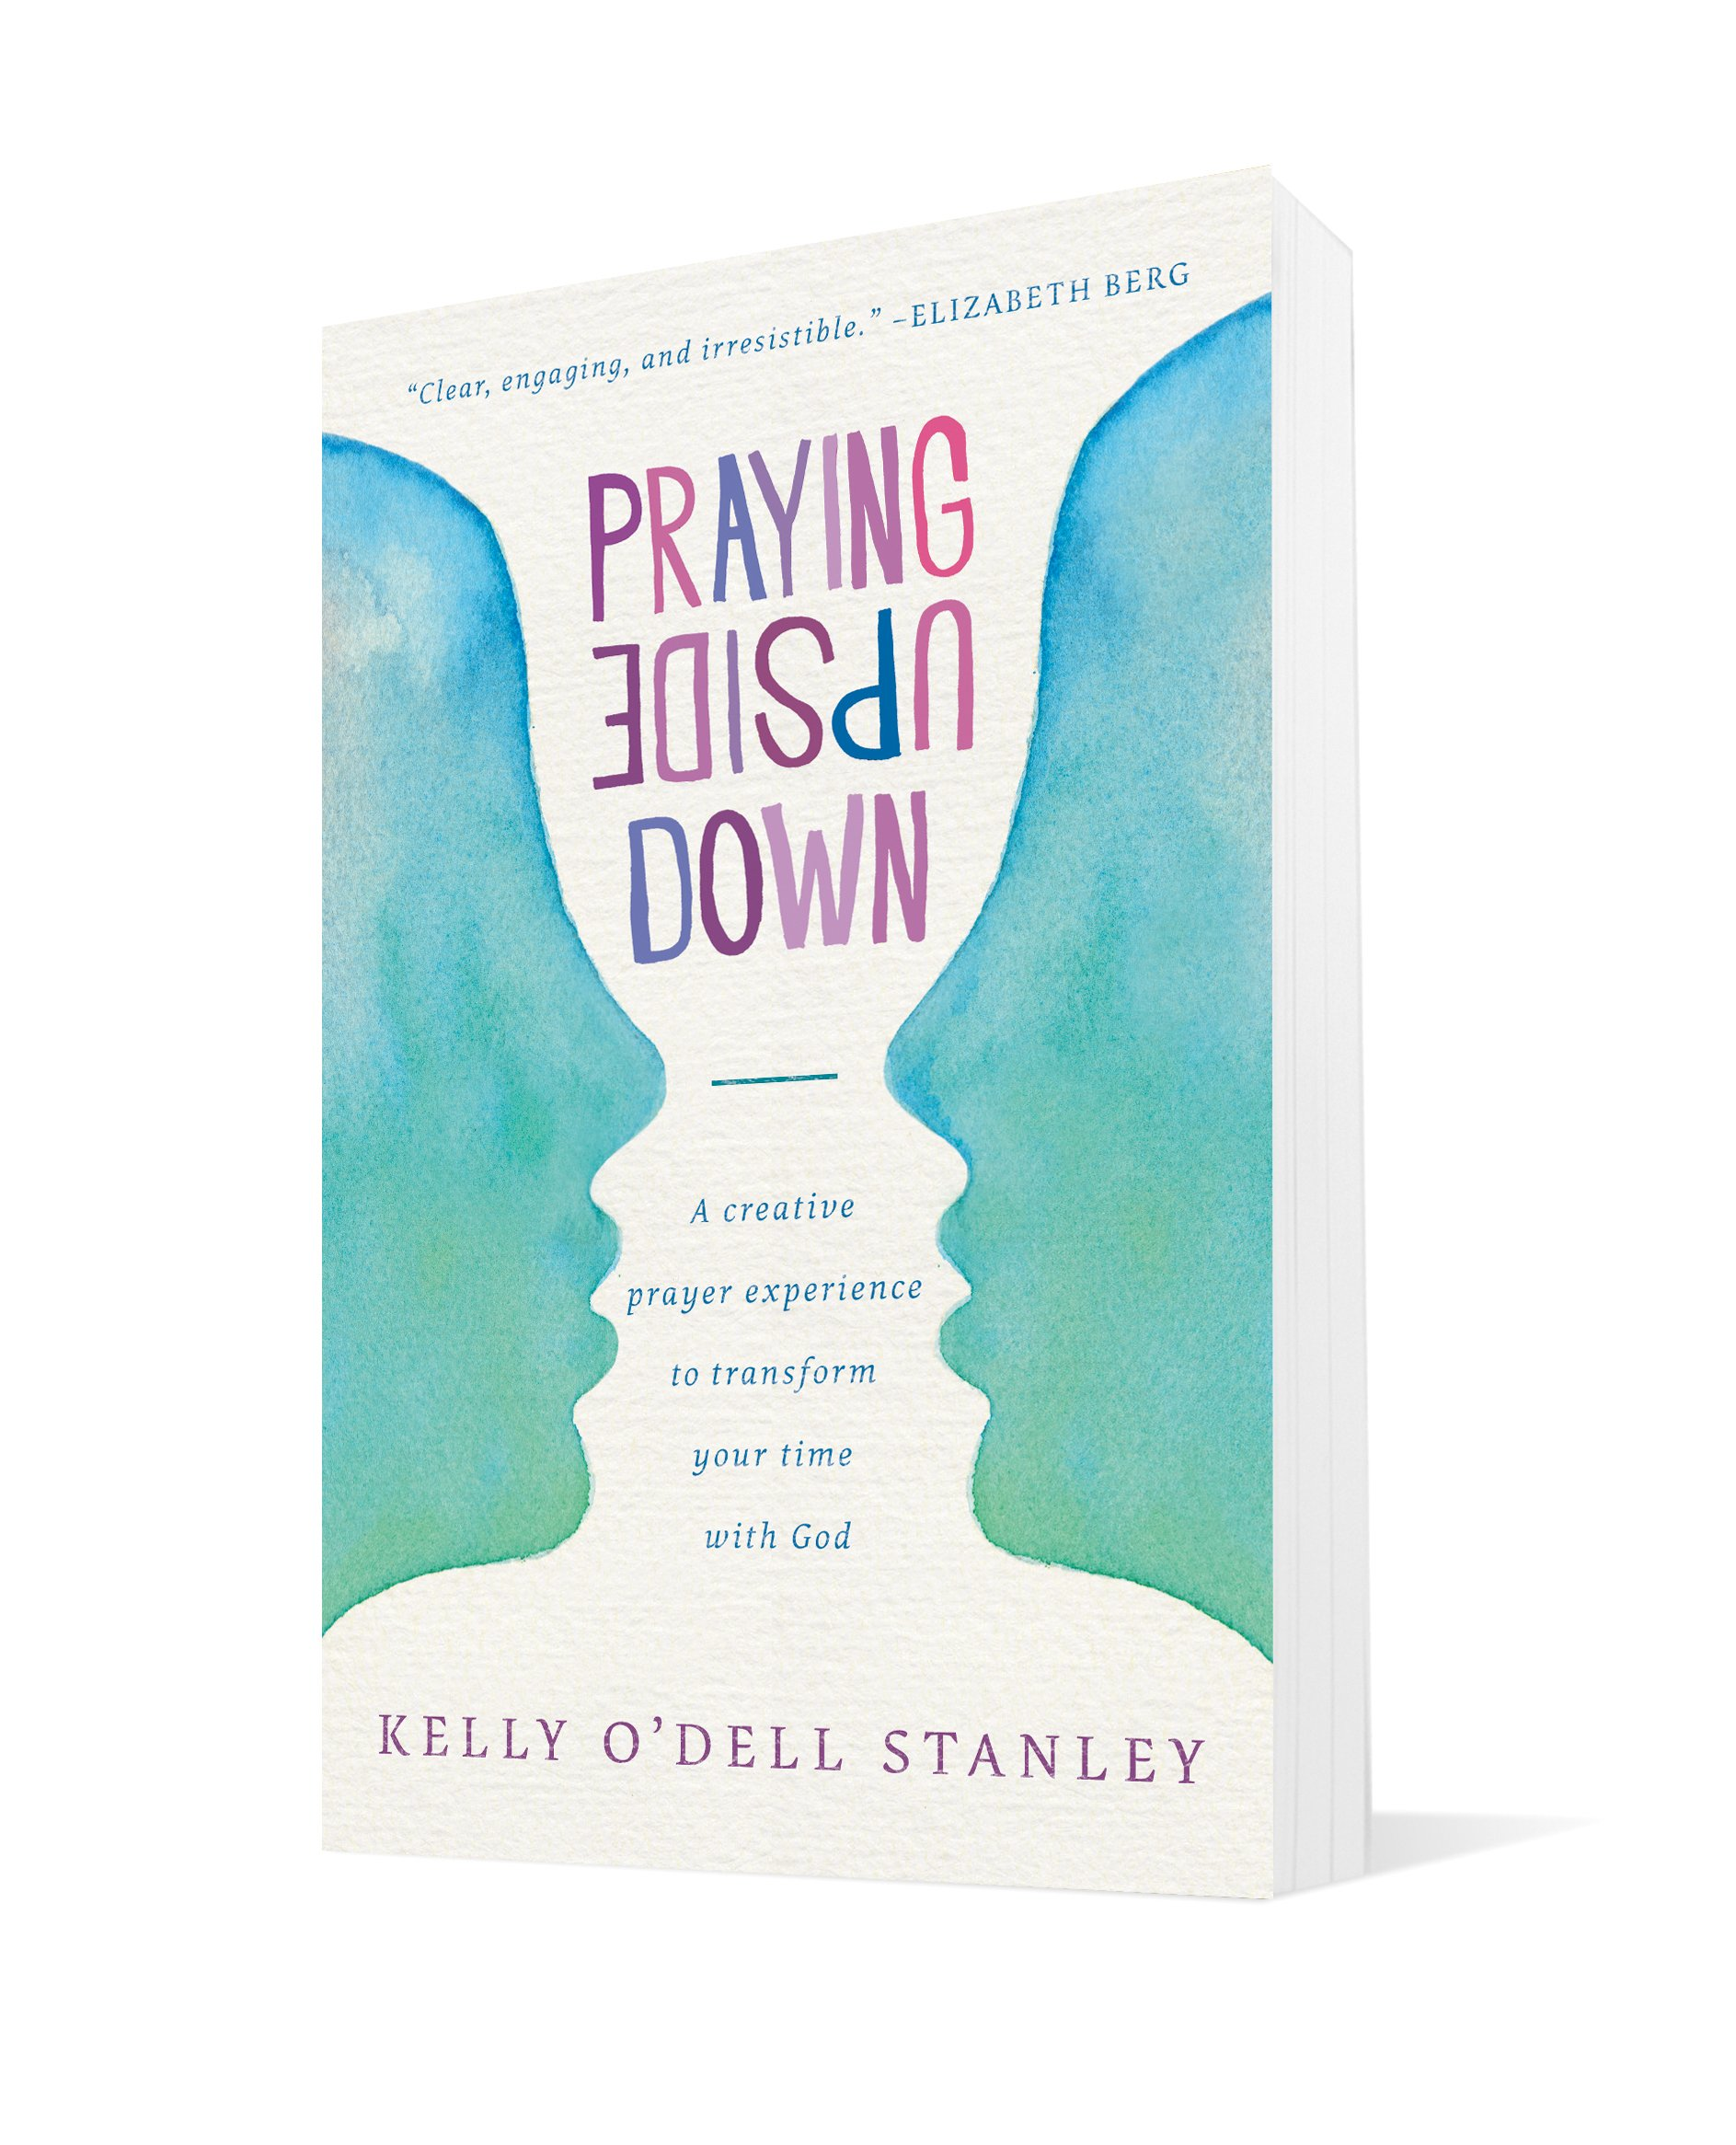 praying upside down a creative prayer experience to transform